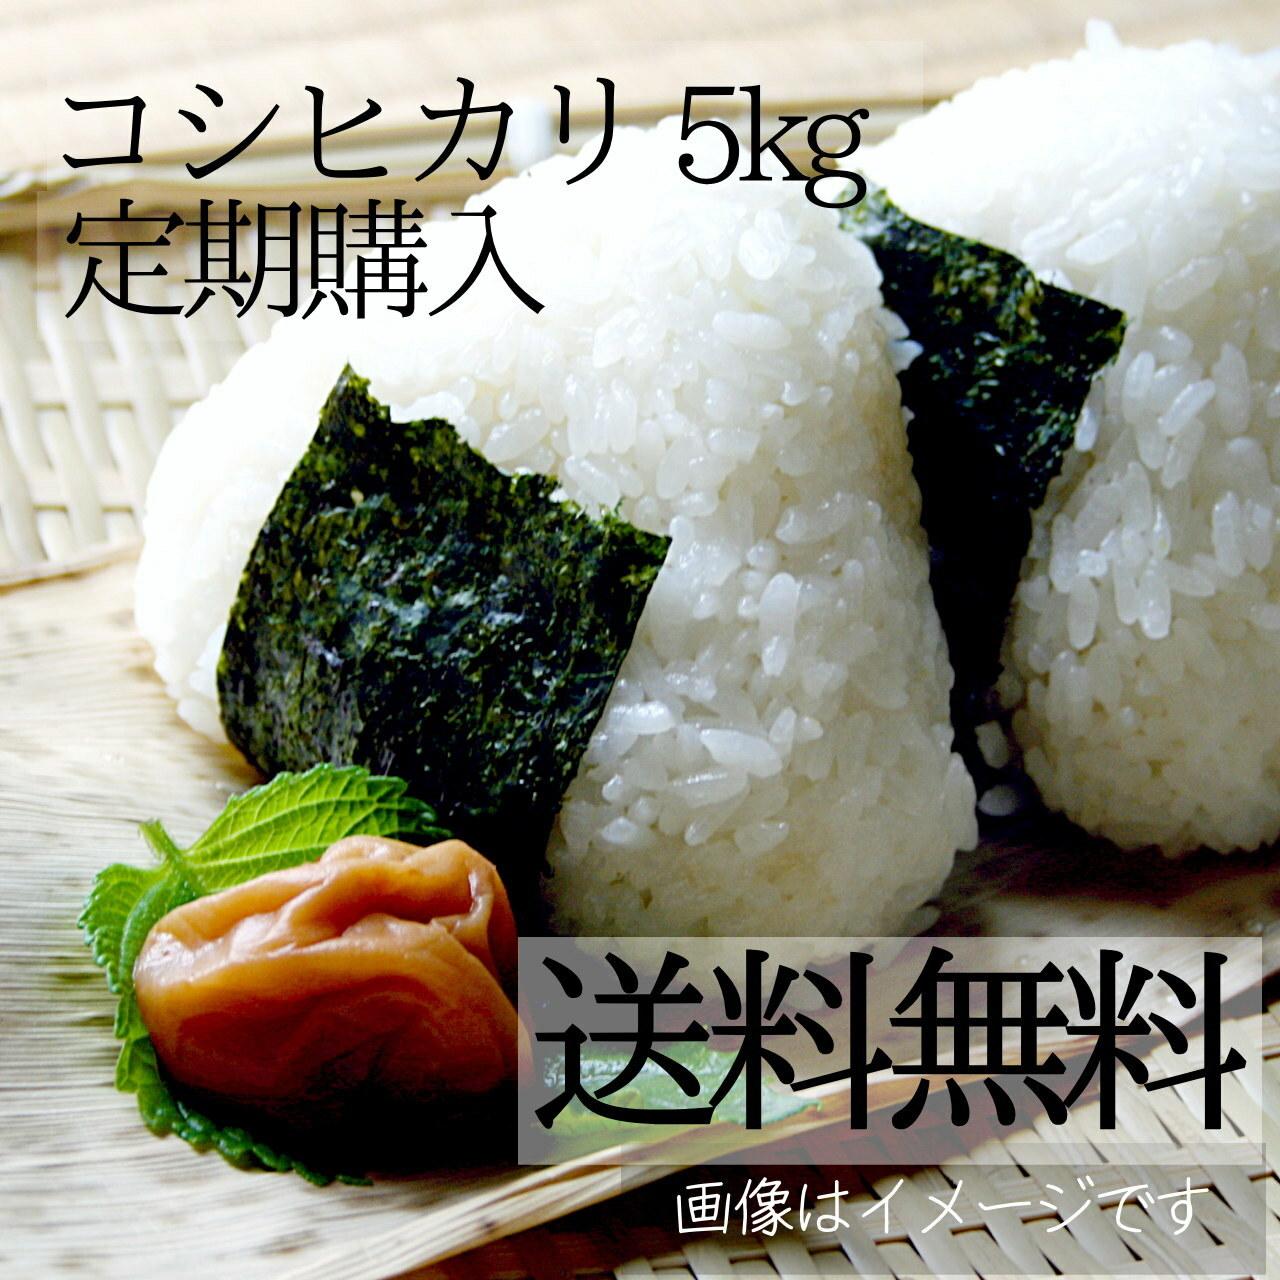 米 5kg(キロ) 新潟コシヒカリ【送料無料】【定期購入】 新潟米 精白米 阿賀野産 2020年 新米